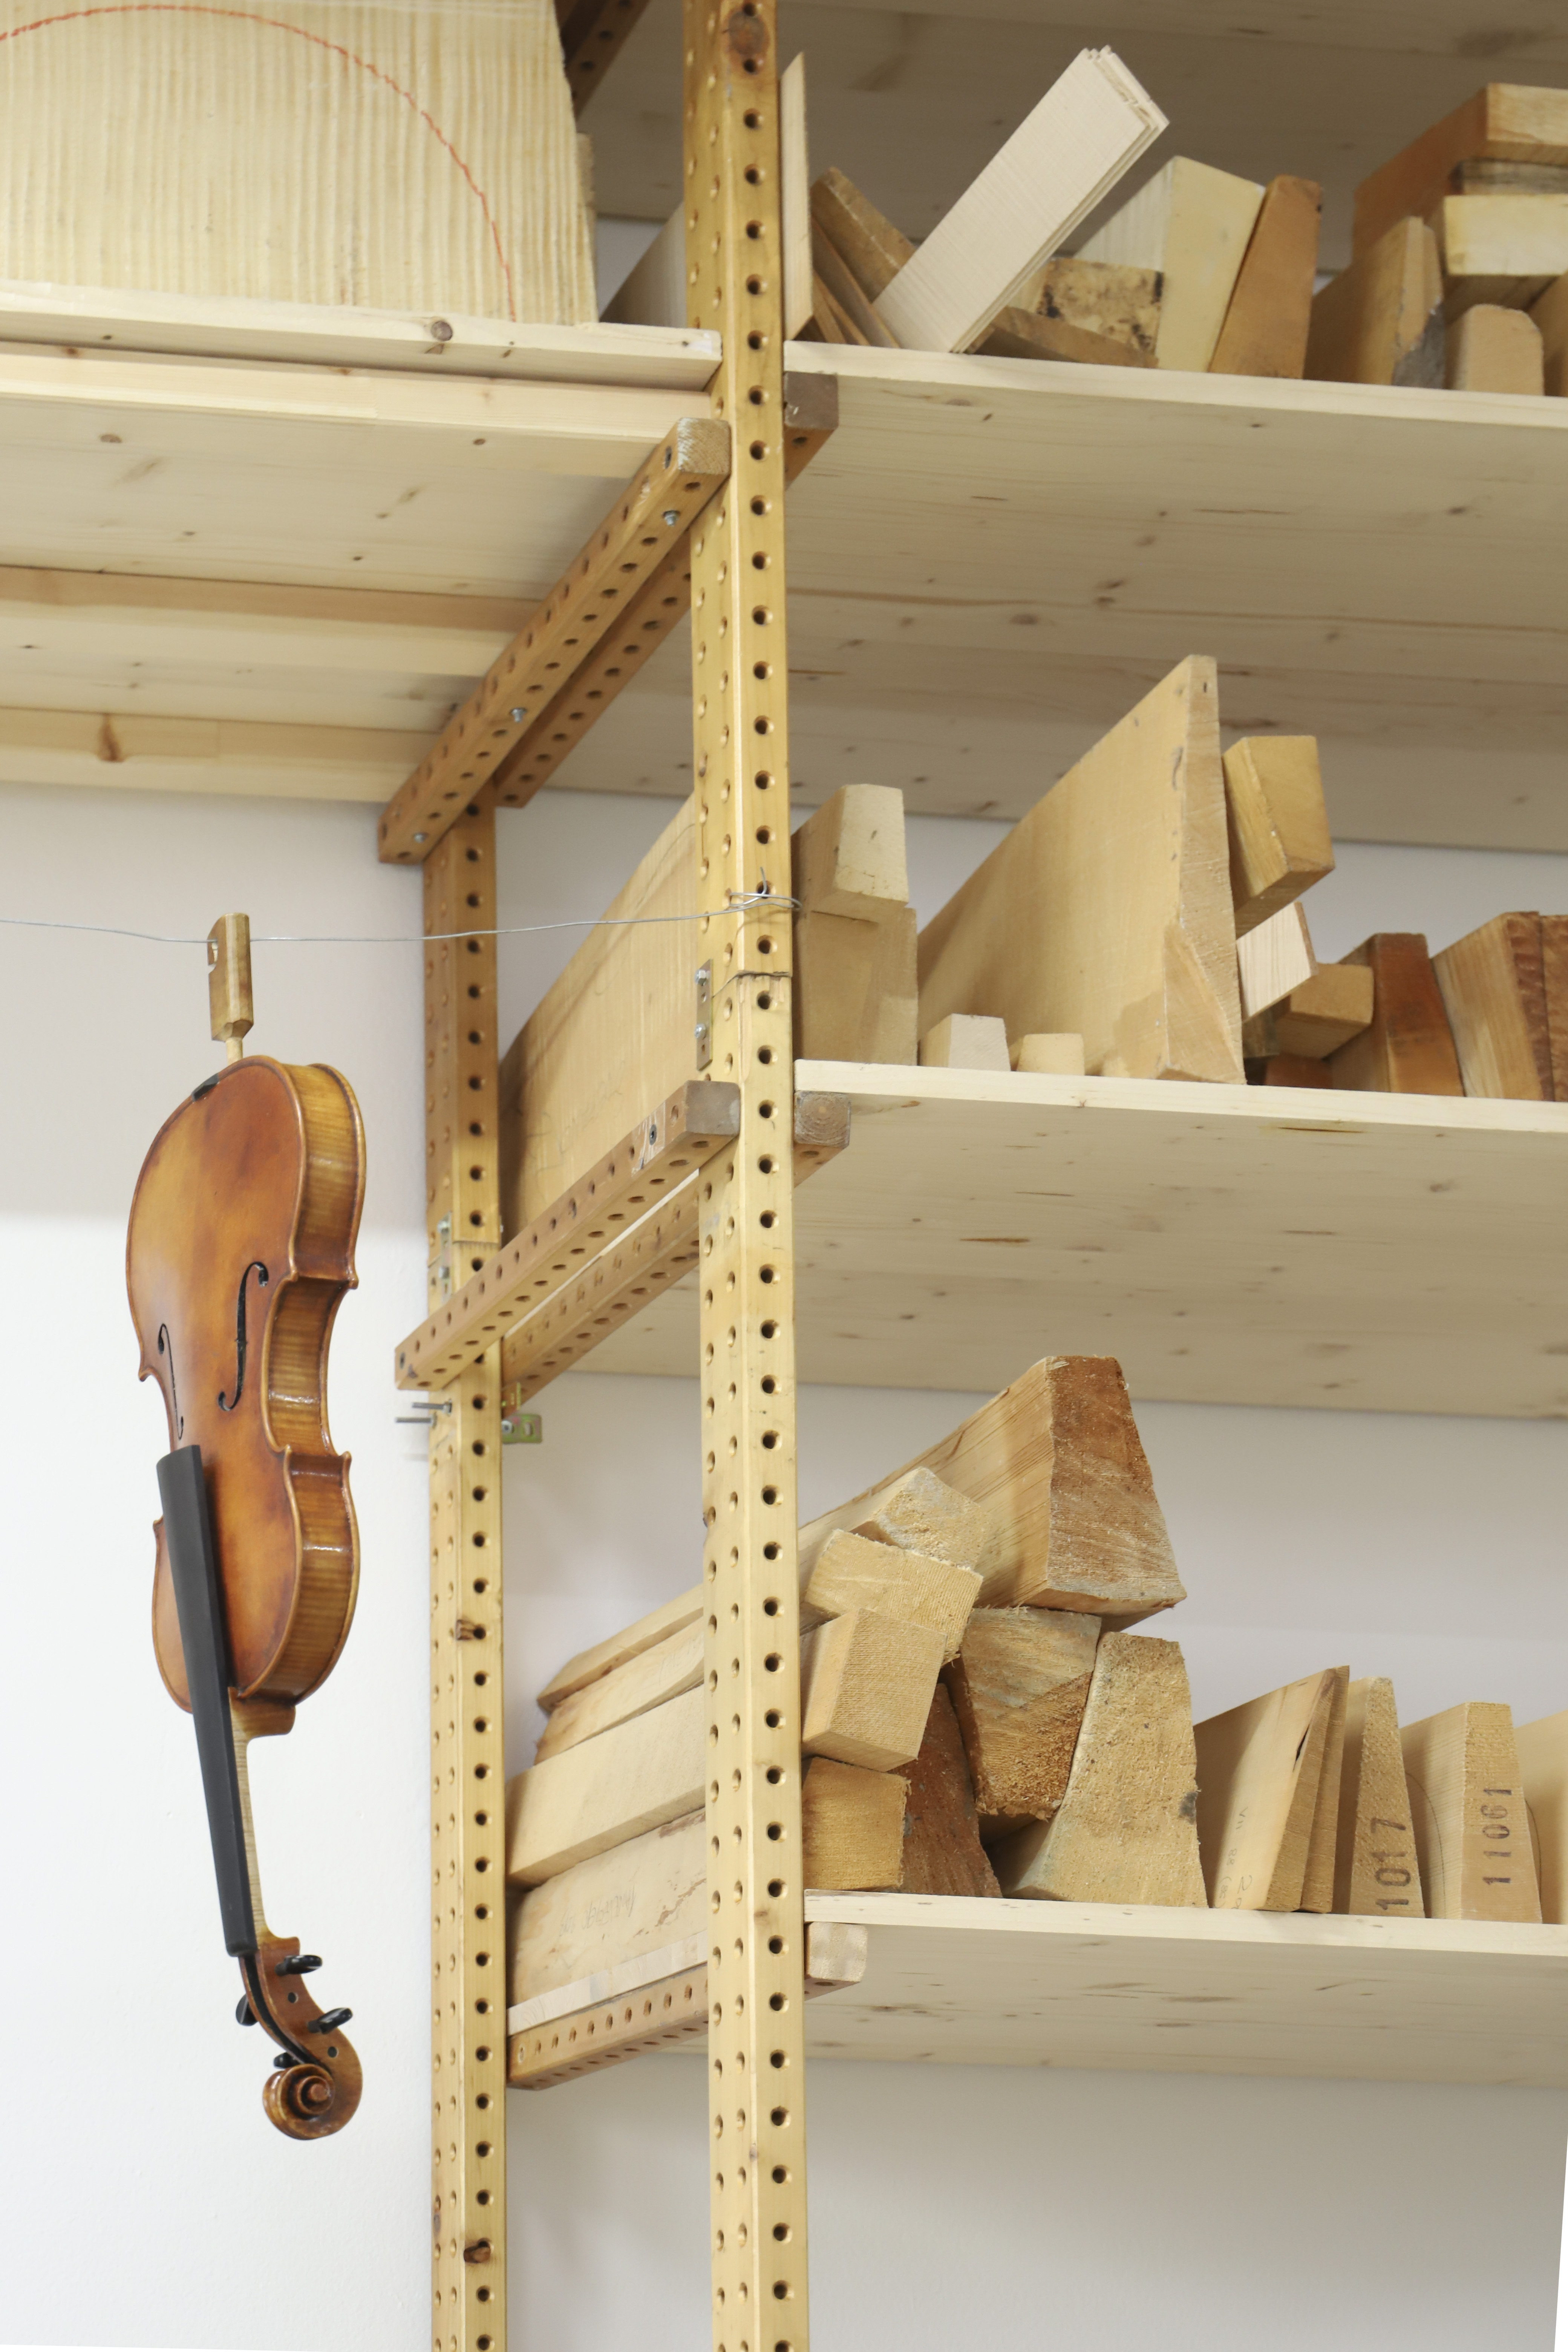 stefano-bertoli-luthier-milan-thumbnail